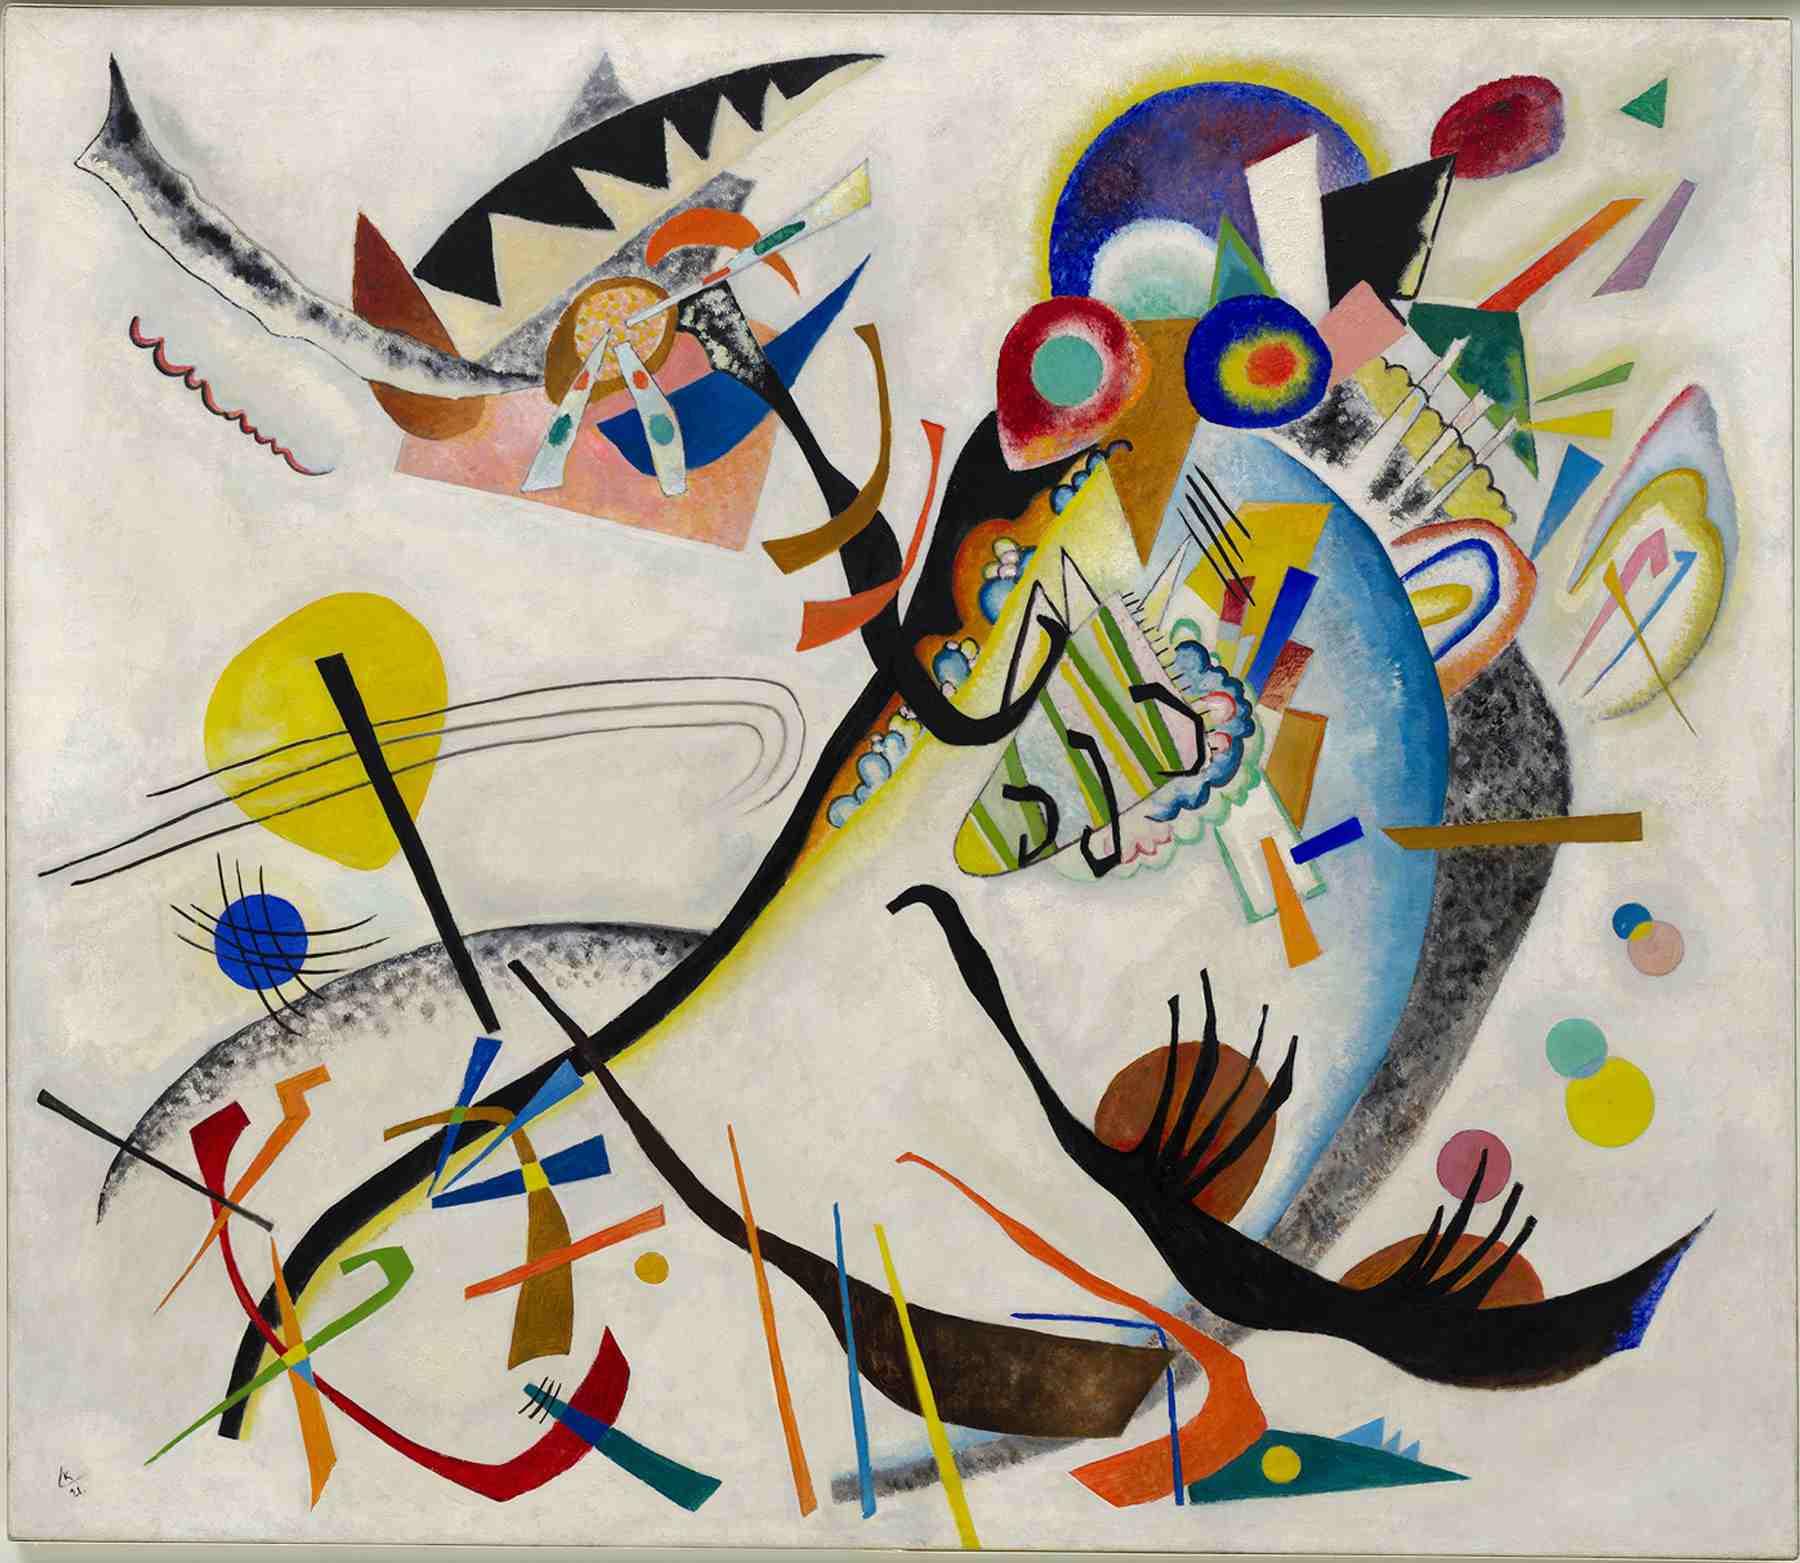 Wassily Kandinsky (Russian, 1866-1944) Wassily Kandinsky (Russian, 1866-1944). Blue Segment (Blaues Segment), 1921. Oil on canvas. 47 1/2 x 55 1/8 in. (120.6 x 140.1 cm). Solomon R. Guggenheim Founding Collection 49.1181. Solomon R. Guggenheim Museum, New York.